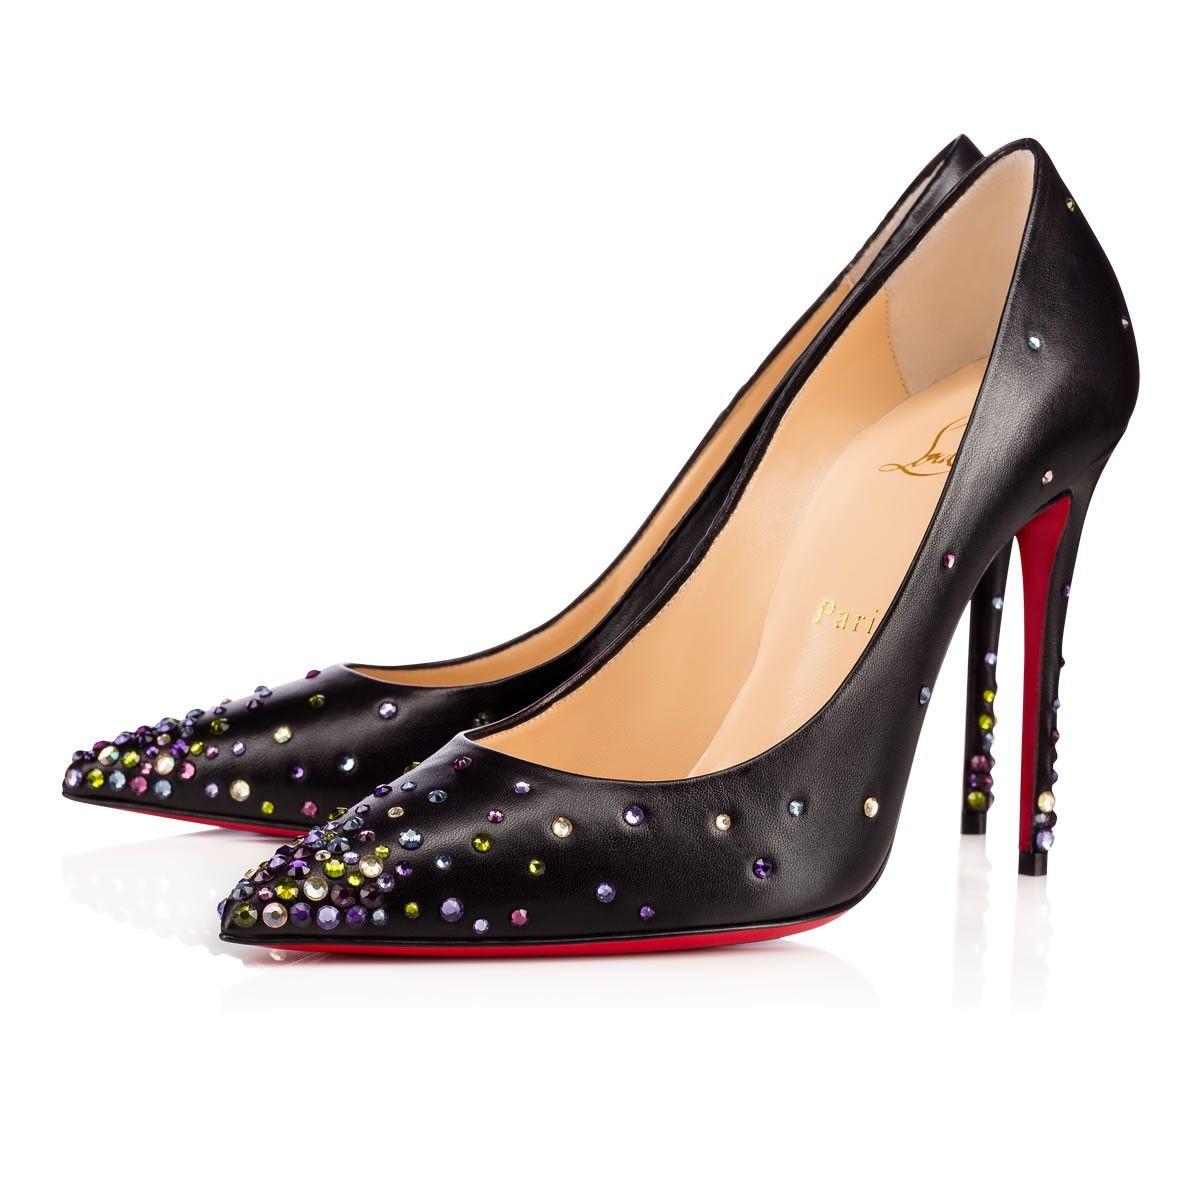 DEGRASTRASS NAPPA SHINY 100 Black/Multicolor Lambskin - Women Shoes - Christian  Louboutin